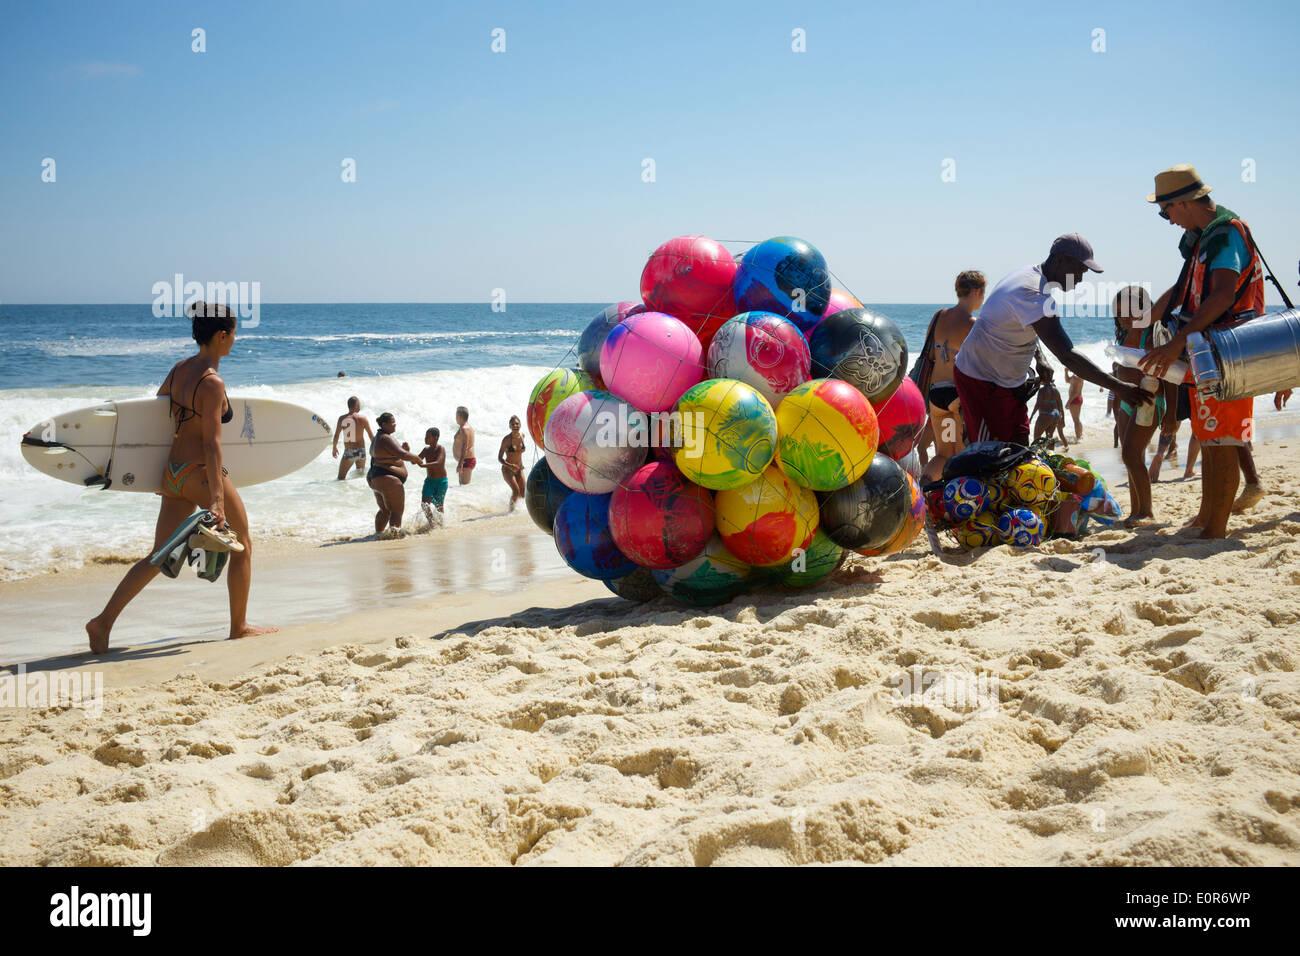 RIO DE JANEIRO, BRAZIL - JANUARY 20, 2014: Woman walks with surfboard on Ipanema Beach past vendors selling beach balls and food - Stock Image